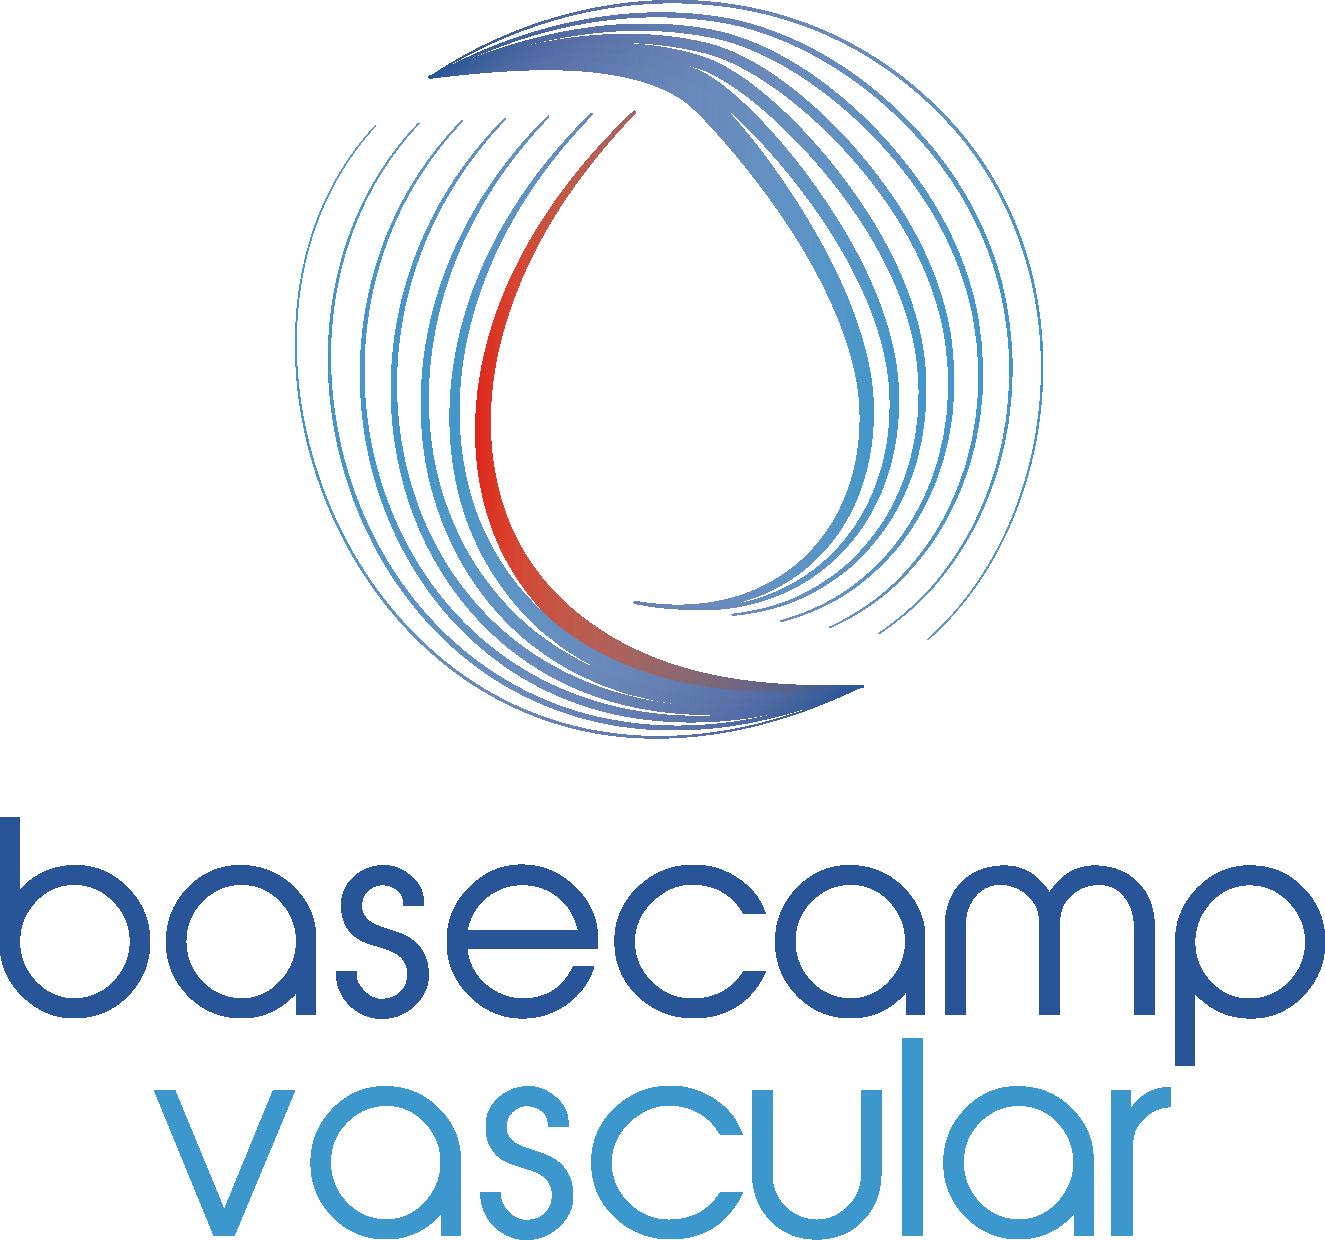 BaseCamp Vascular